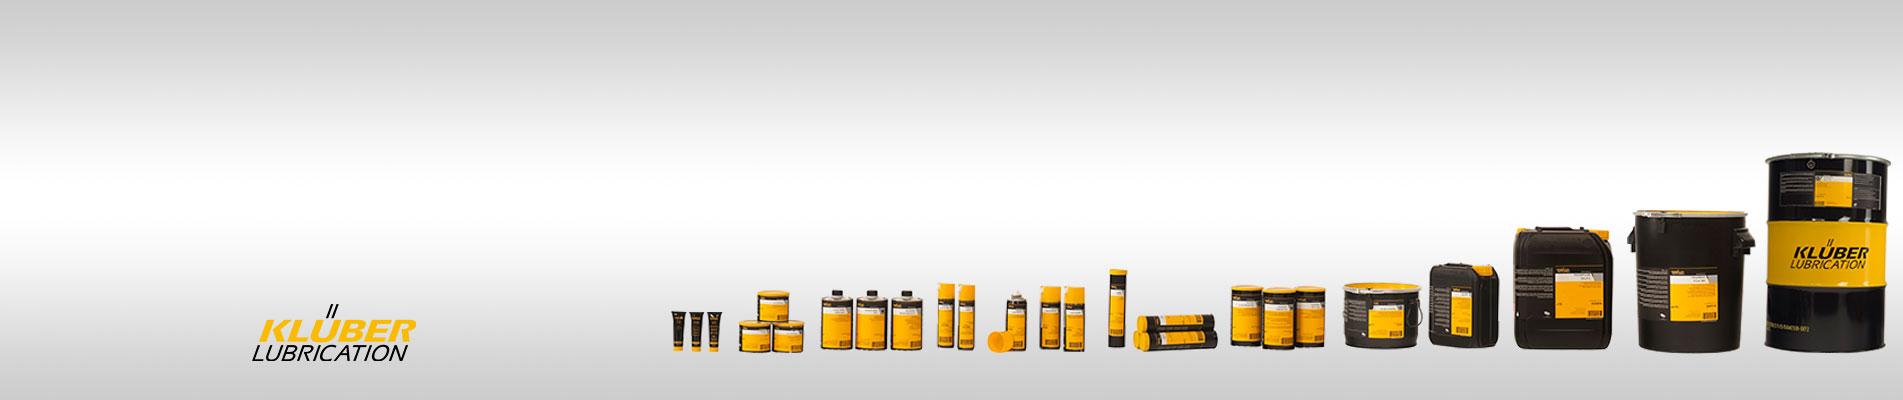 kluber lubrication 4